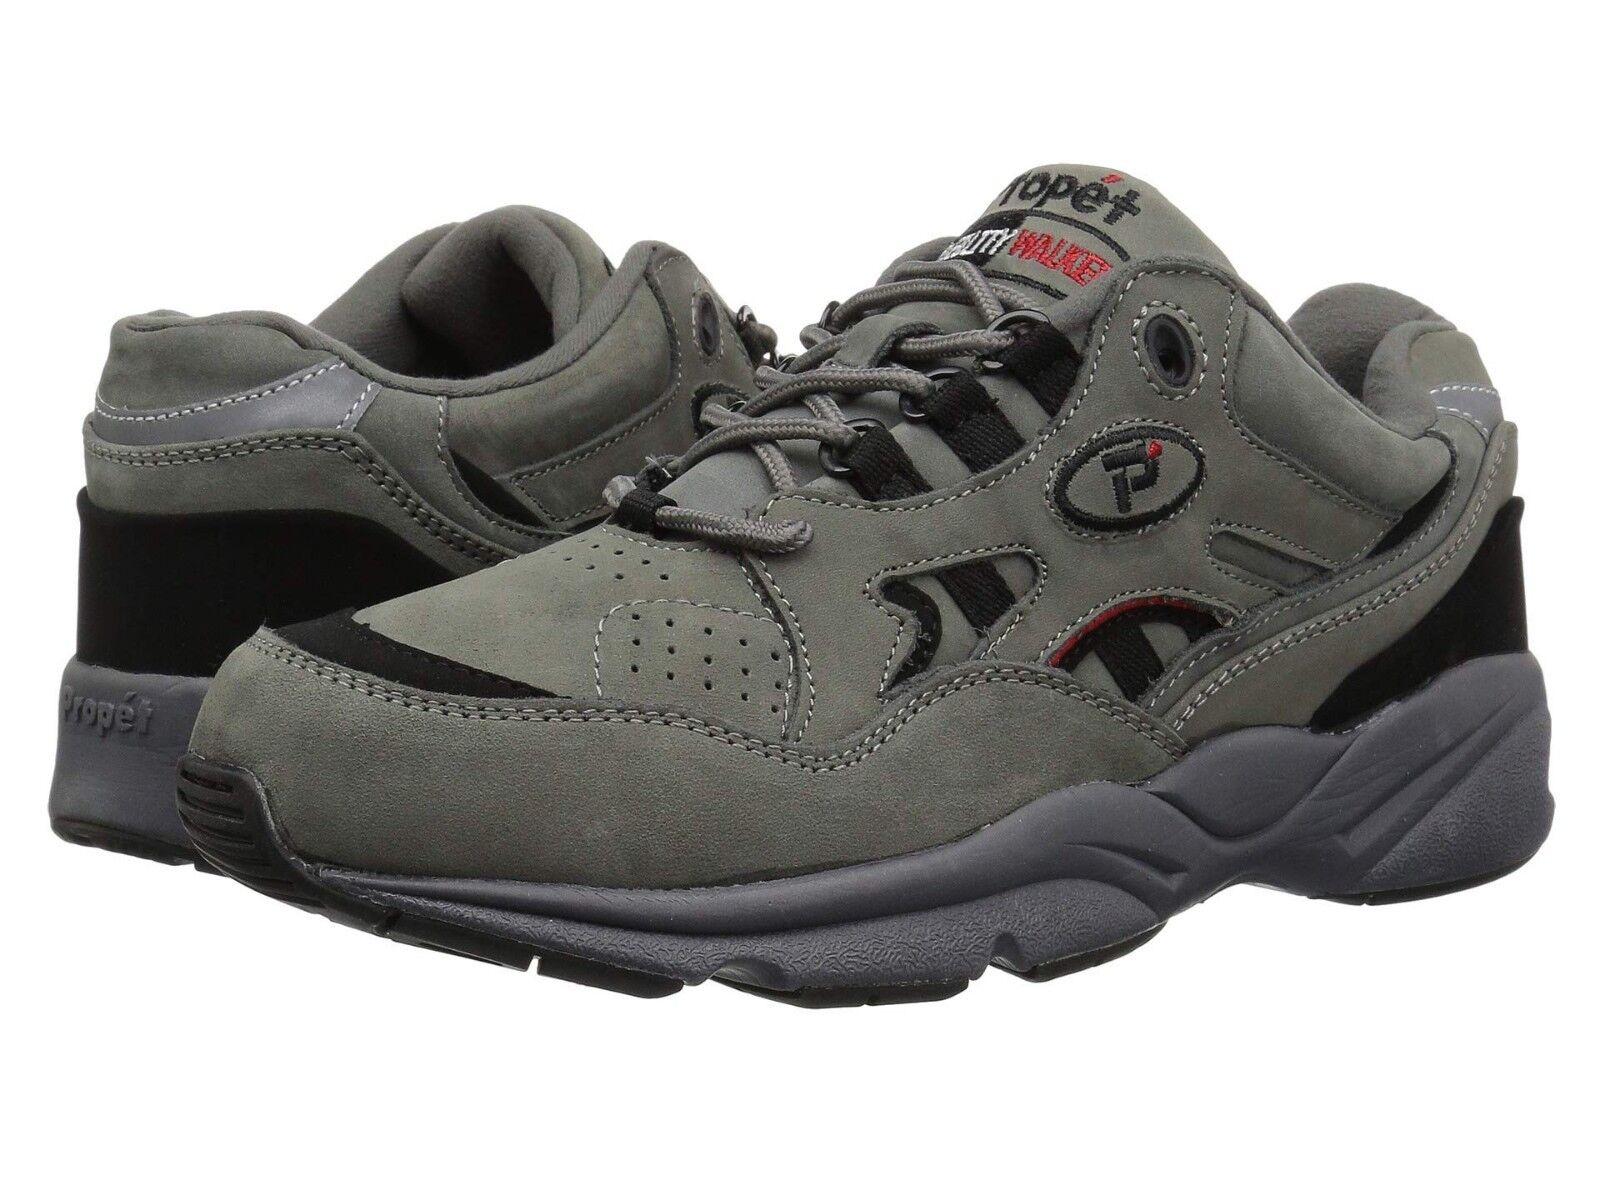 NEW Mens Mens Mens Propet Stability Walker Grey Black Nubuck Leather Walking shoes GENUINE dbfbf6